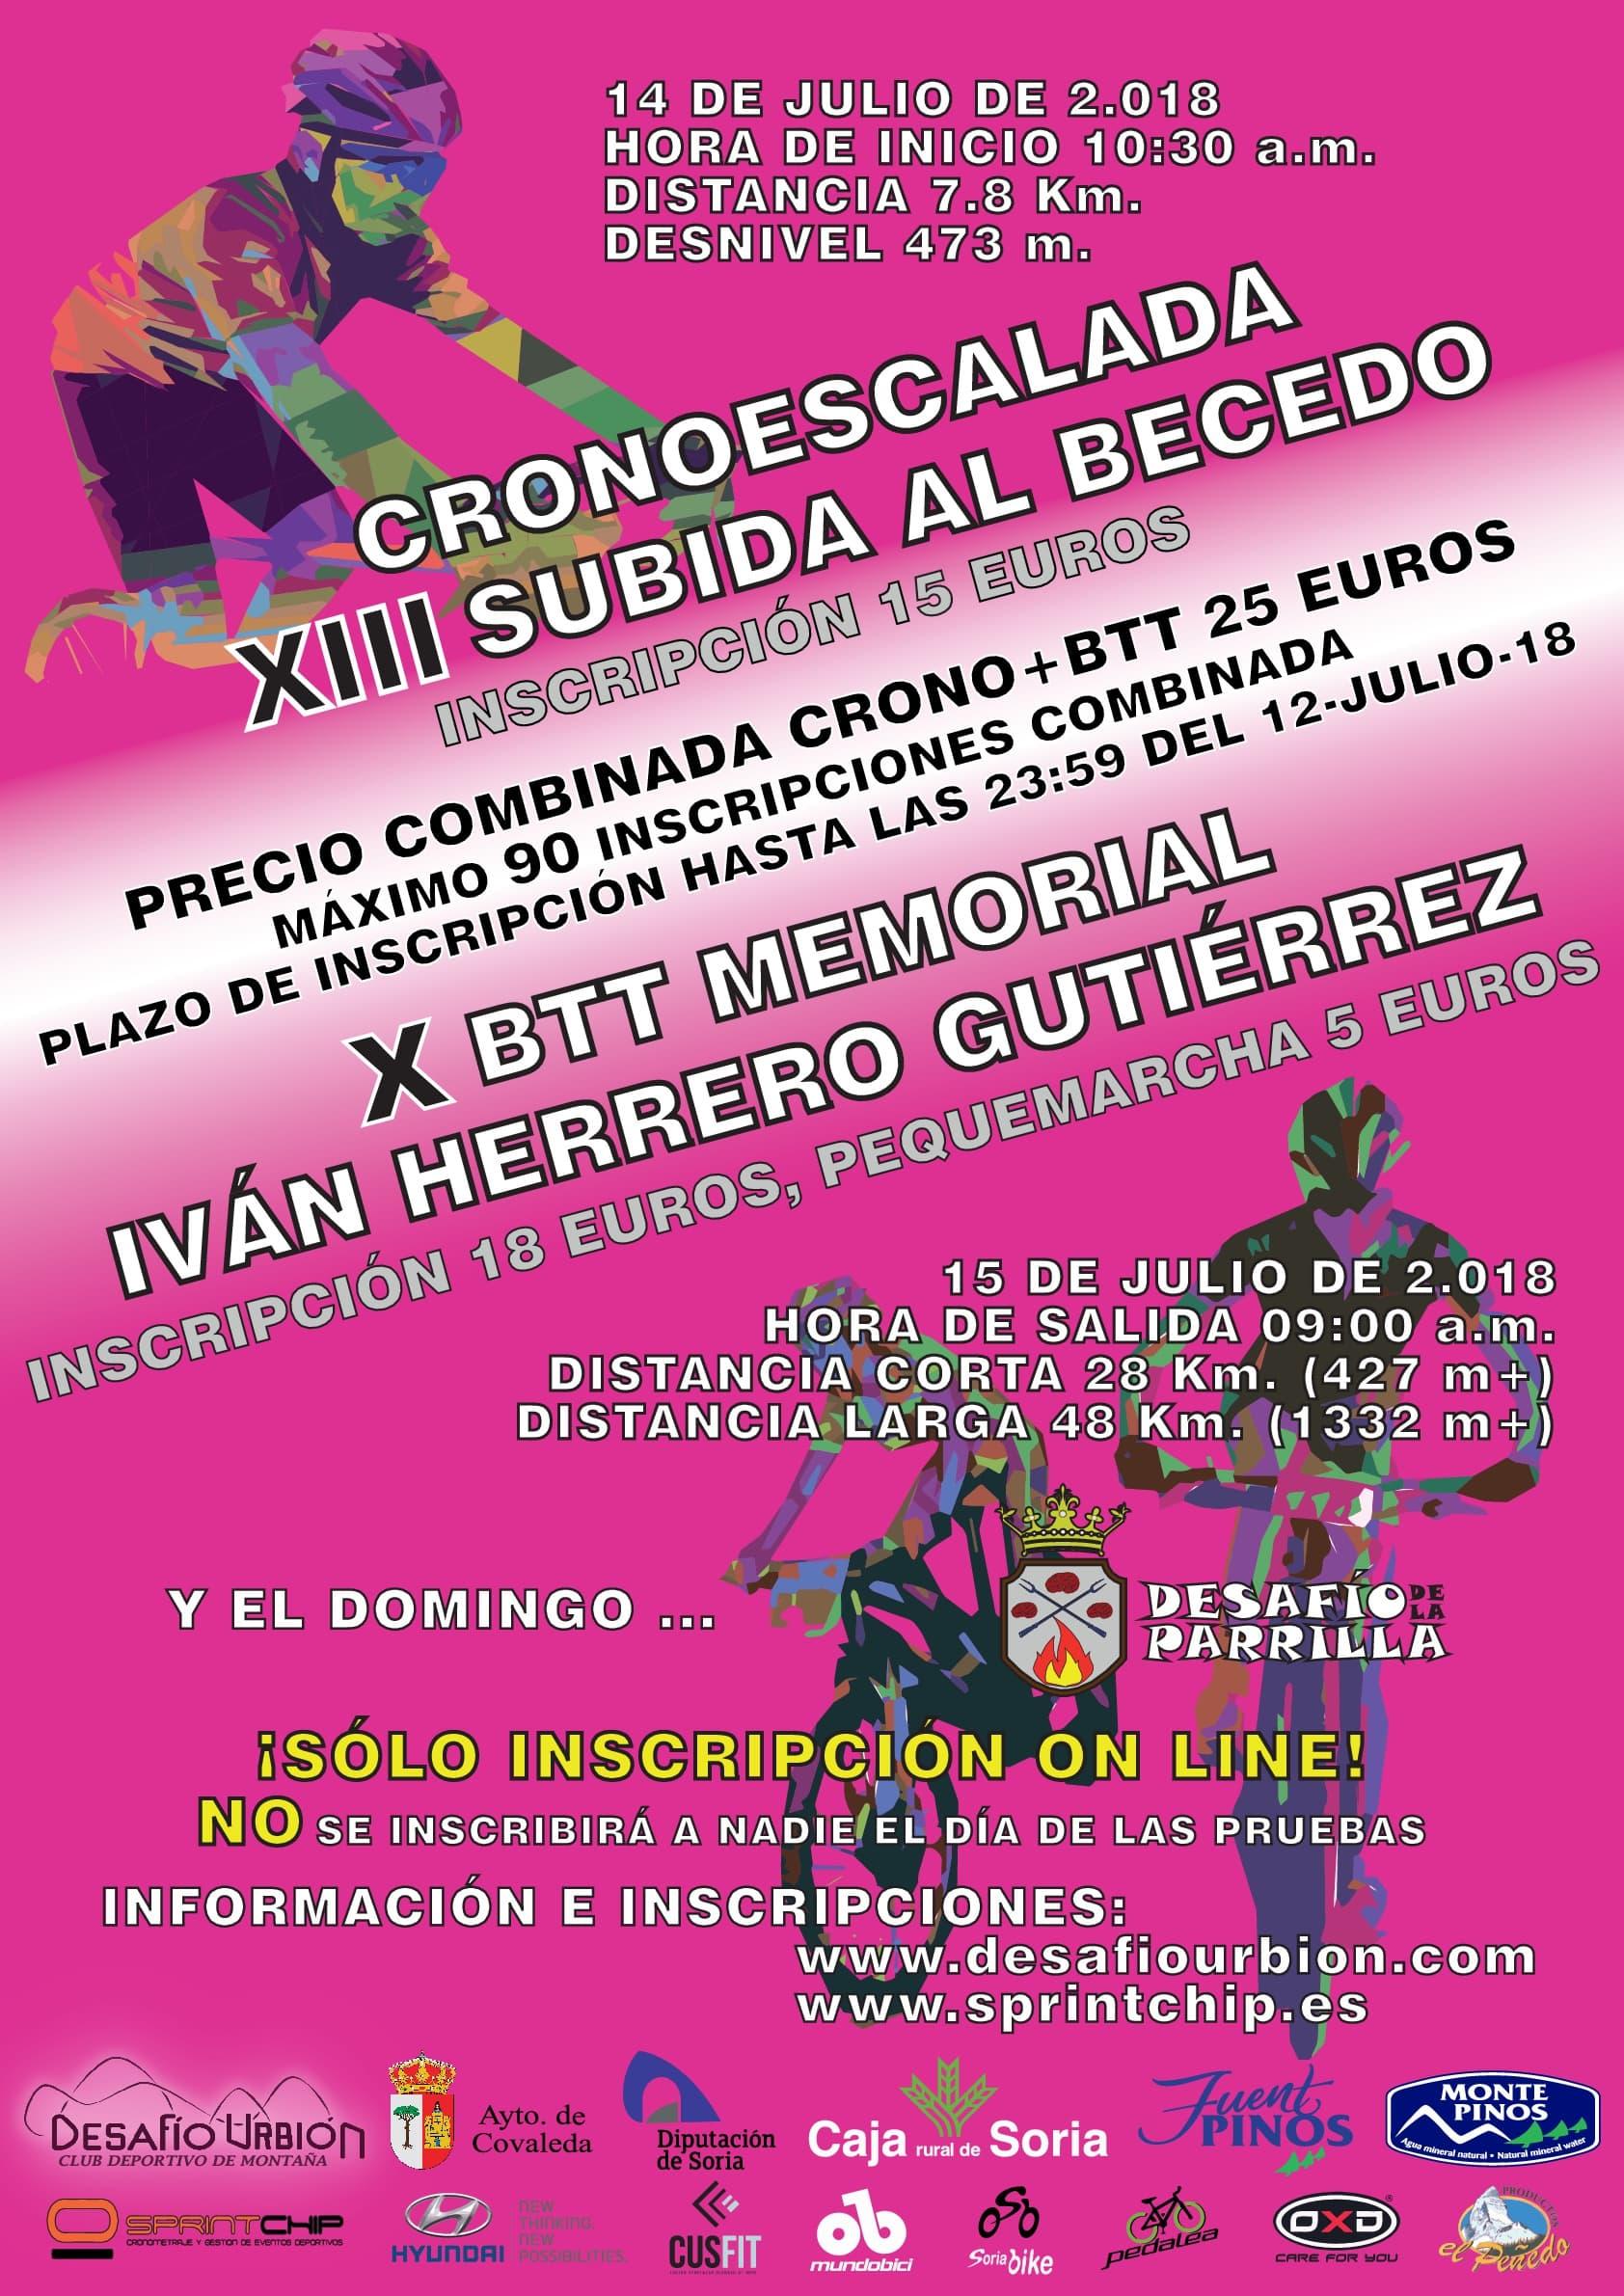 XIII Crono Escala 'Subida al Becedo' - X Memorial Ivan Herrero Gutierrez - Sprint Chip